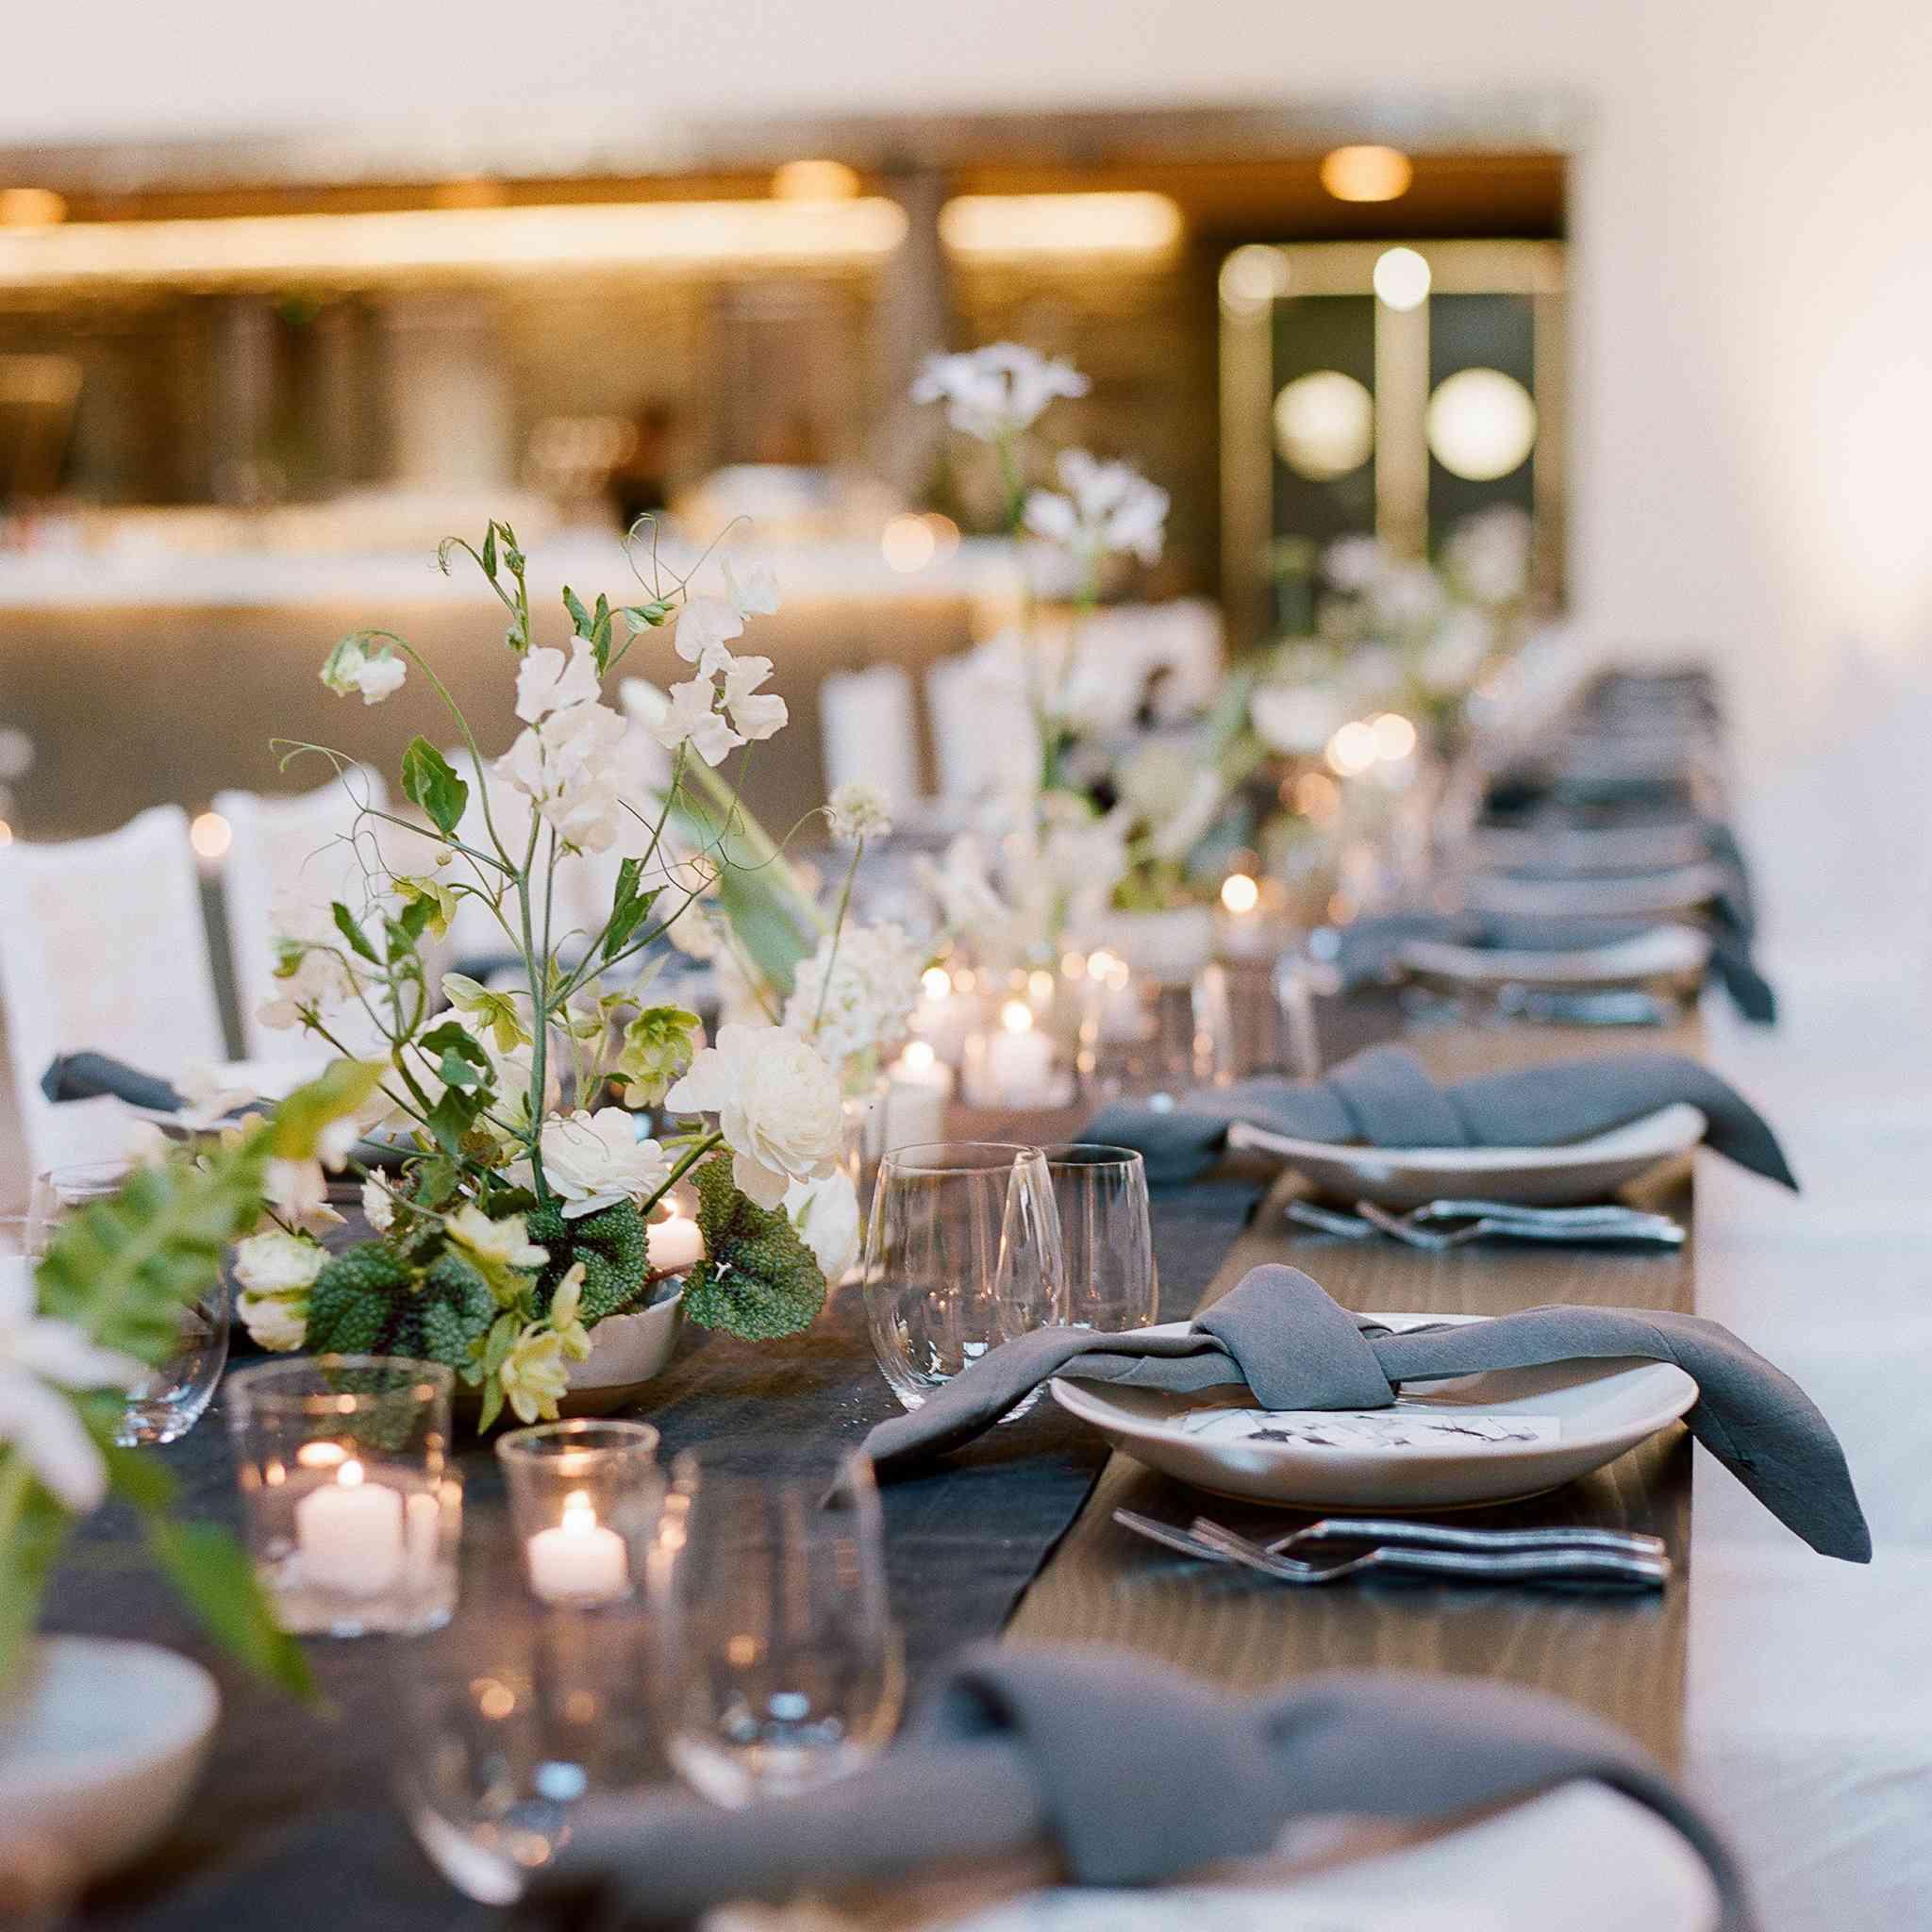 Table setup at a wedding reception